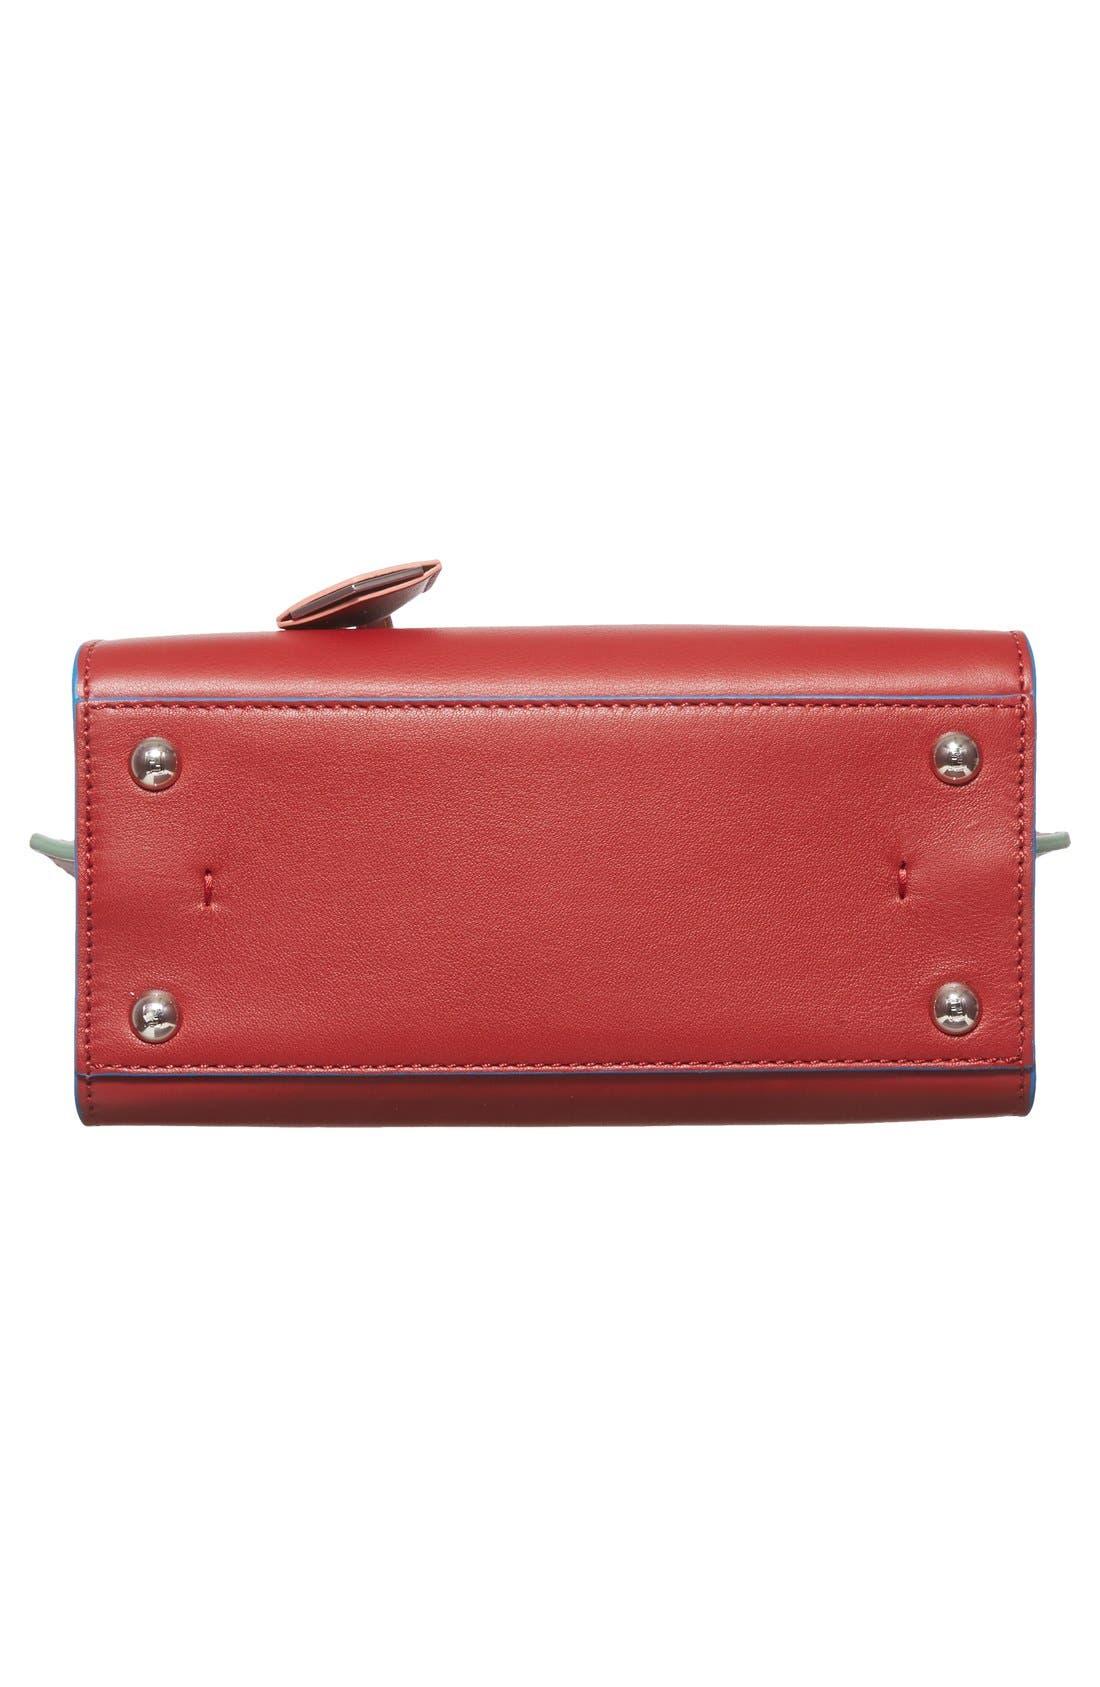 'Mini 3Jours' Calfskin Leather Shopper,                             Alternate thumbnail 22, color,